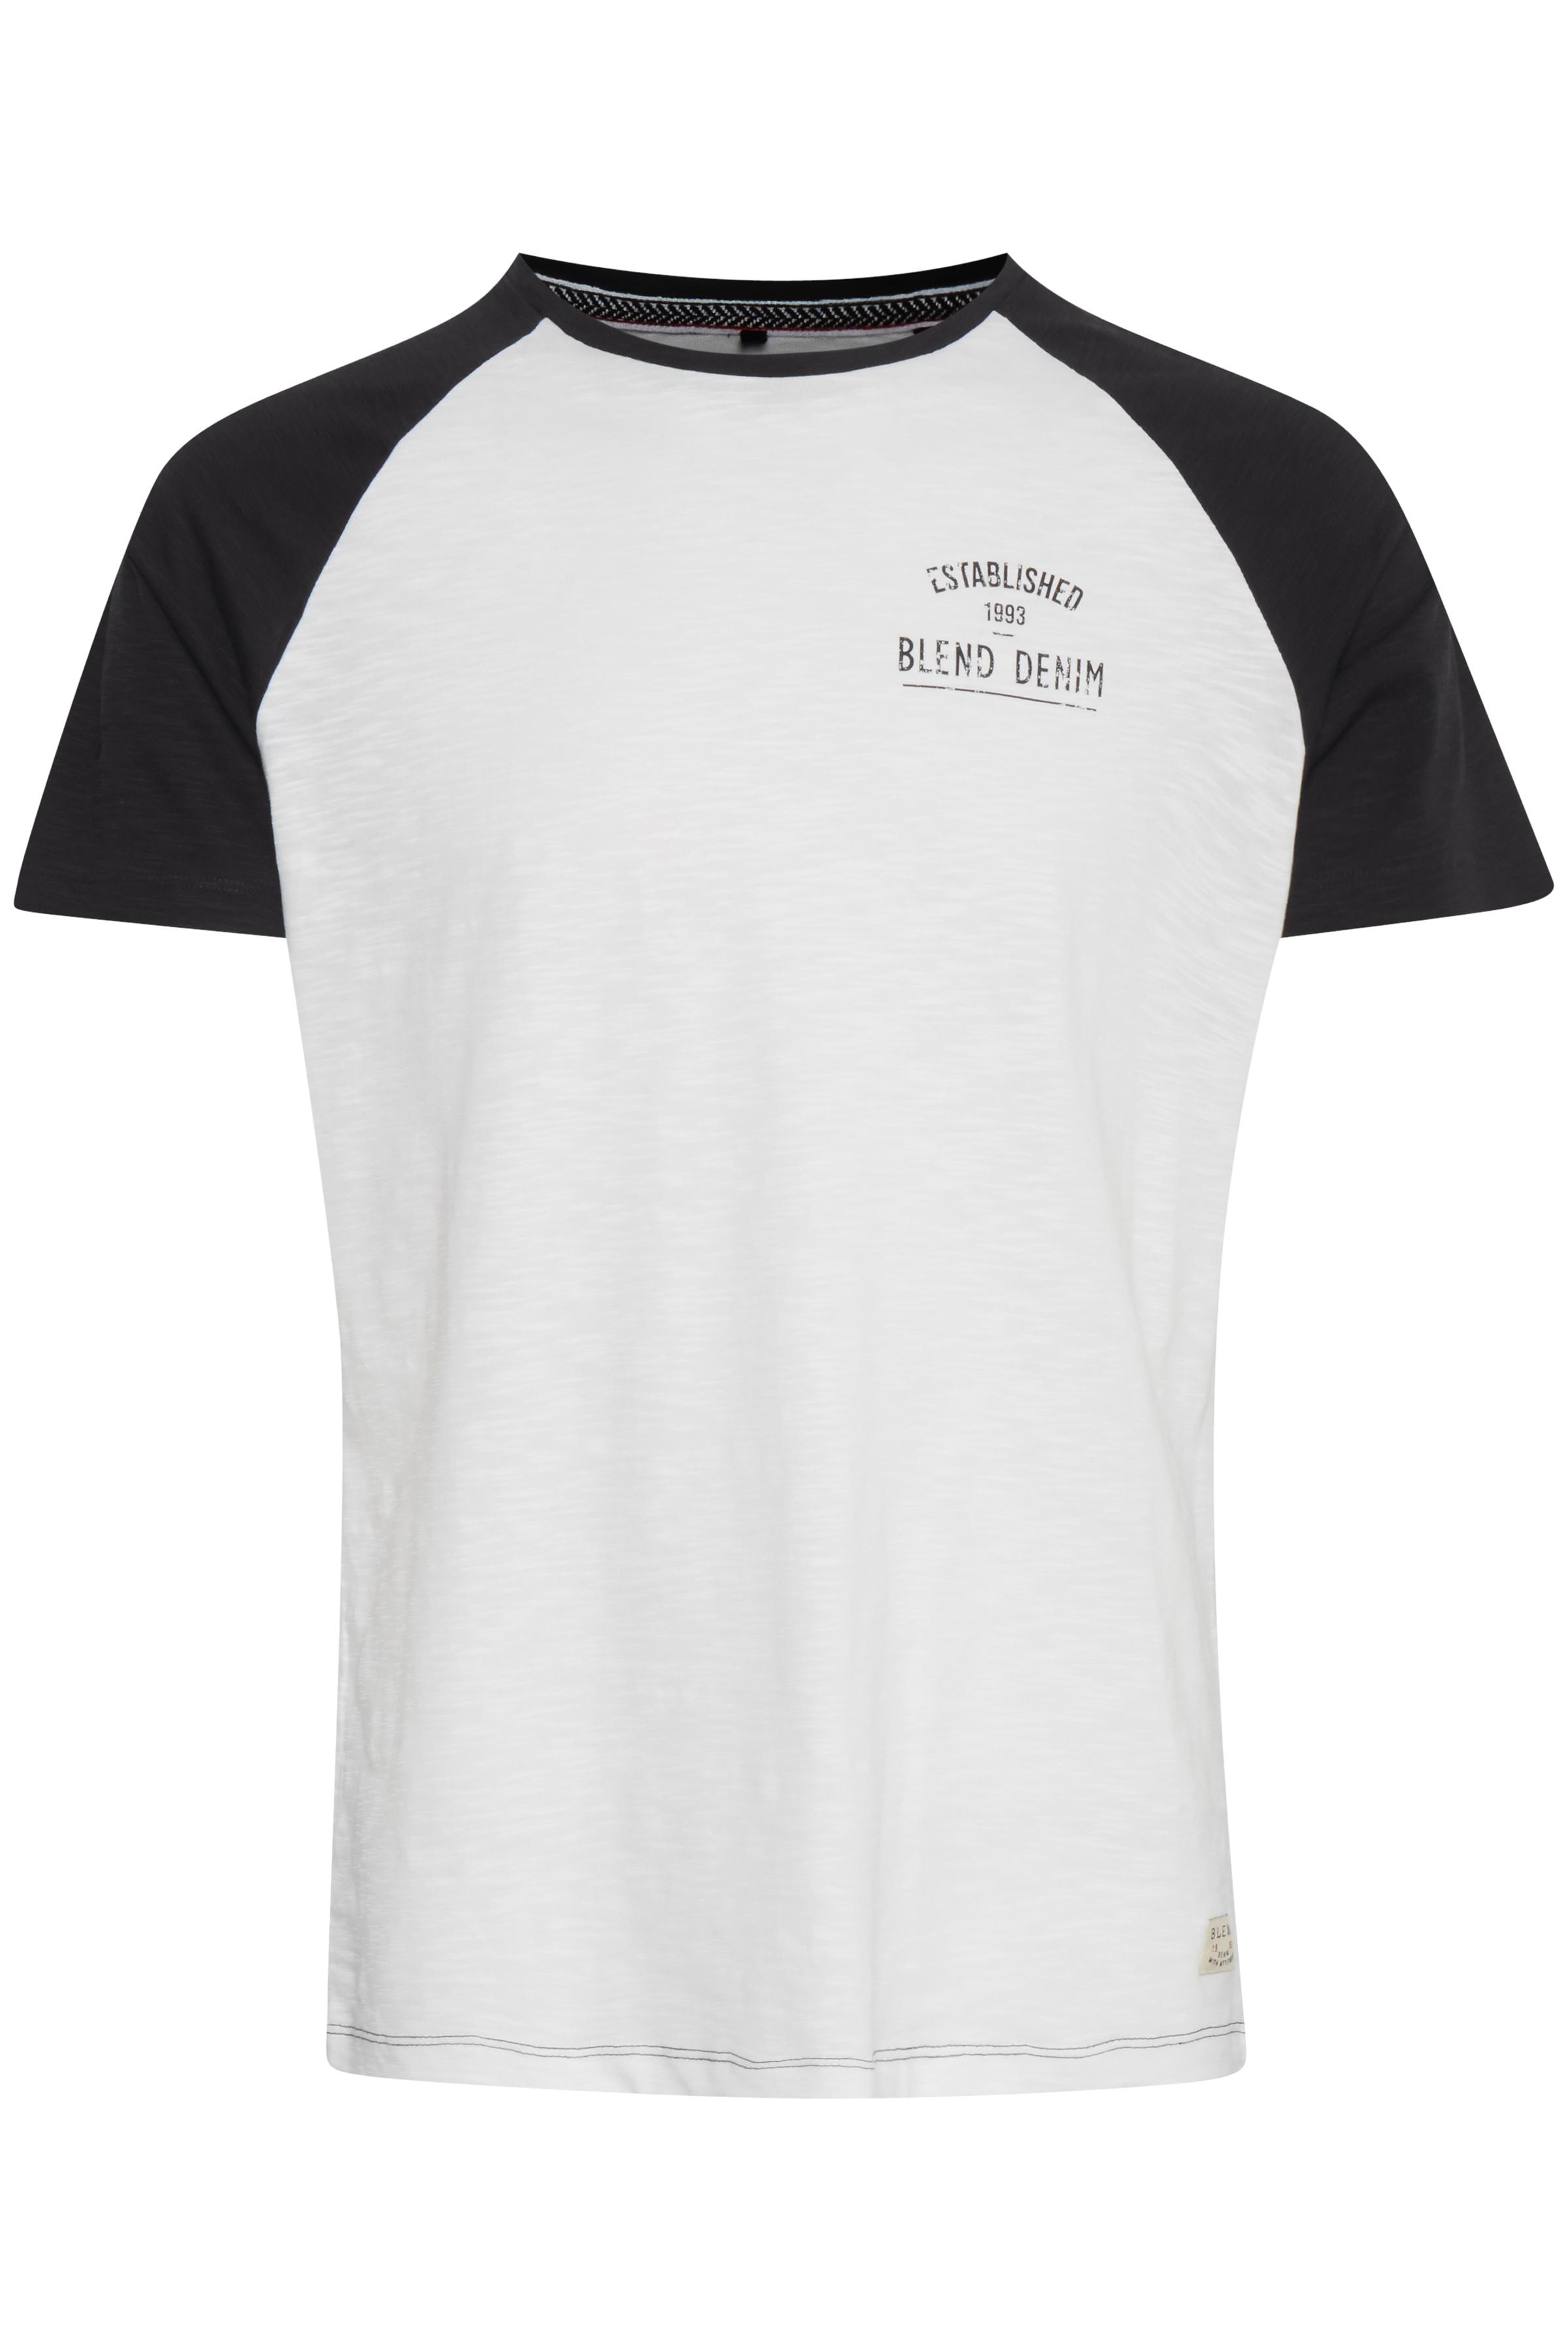 Dark Navy Blue T-shirt – Køb Dark Navy Blue T-shirt fra str. S-XXL her